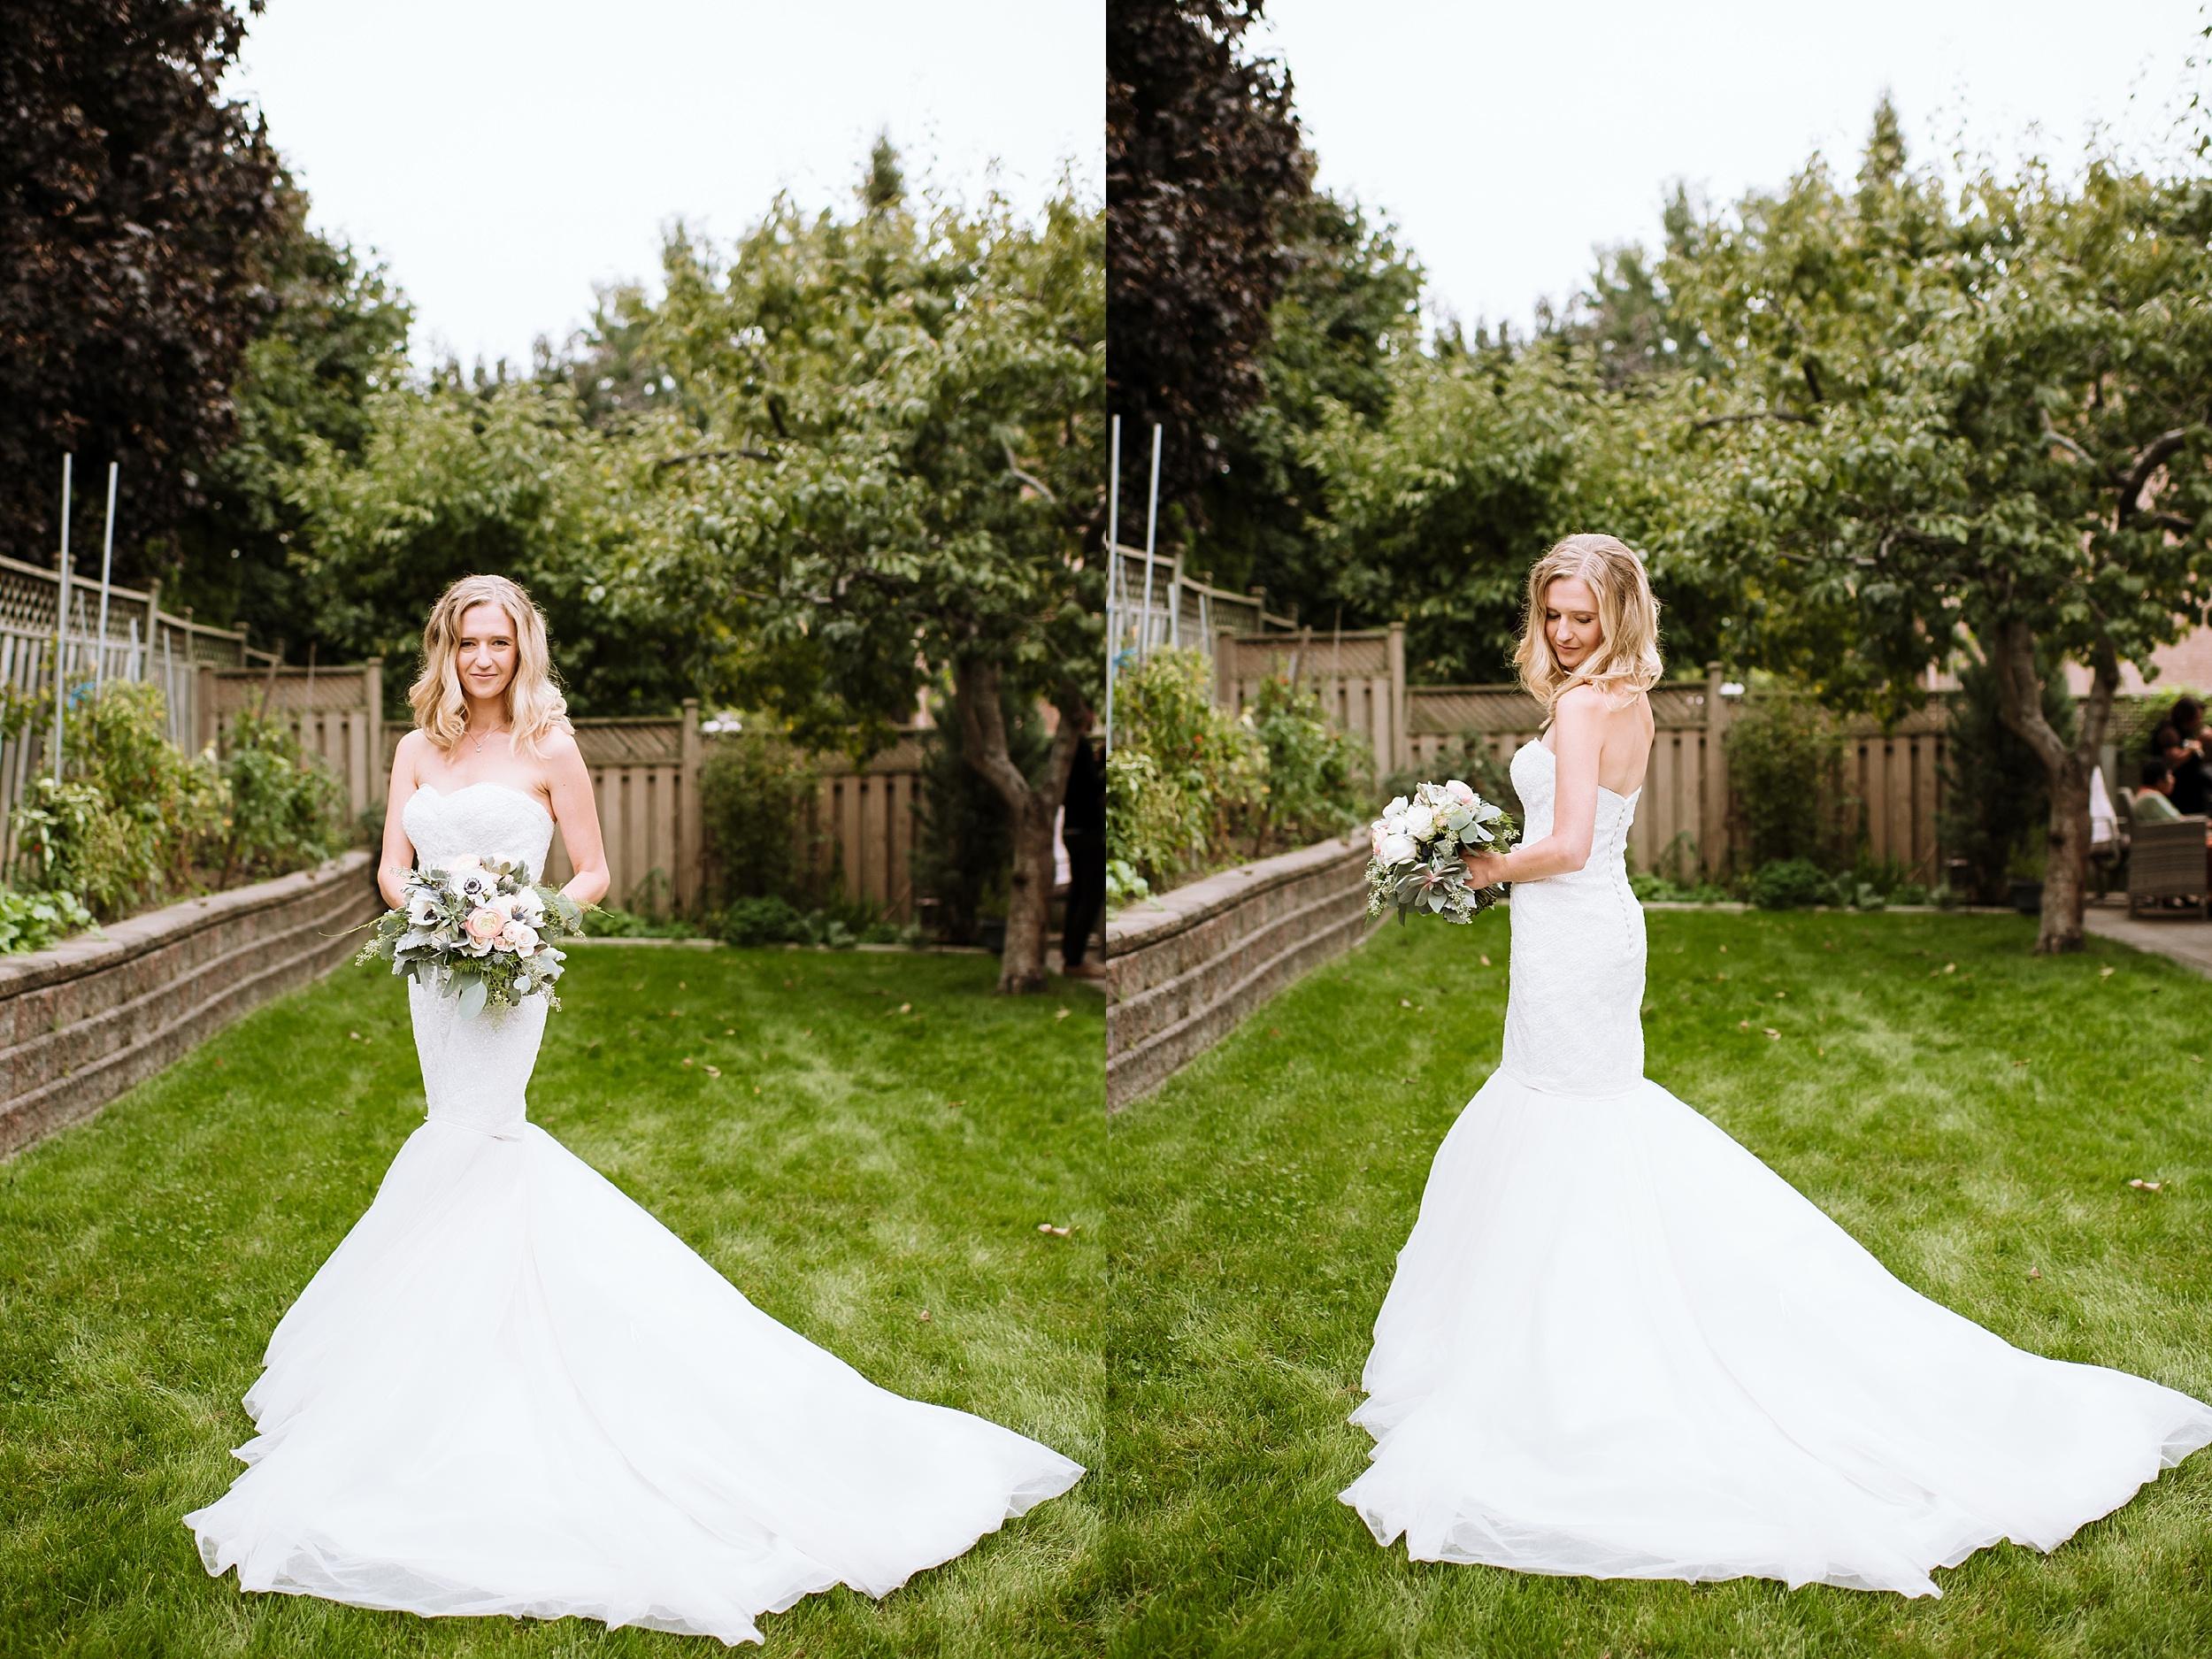 Kariya_Park_Wedding_Shoot_Toronto_Photographer_0070.jpg